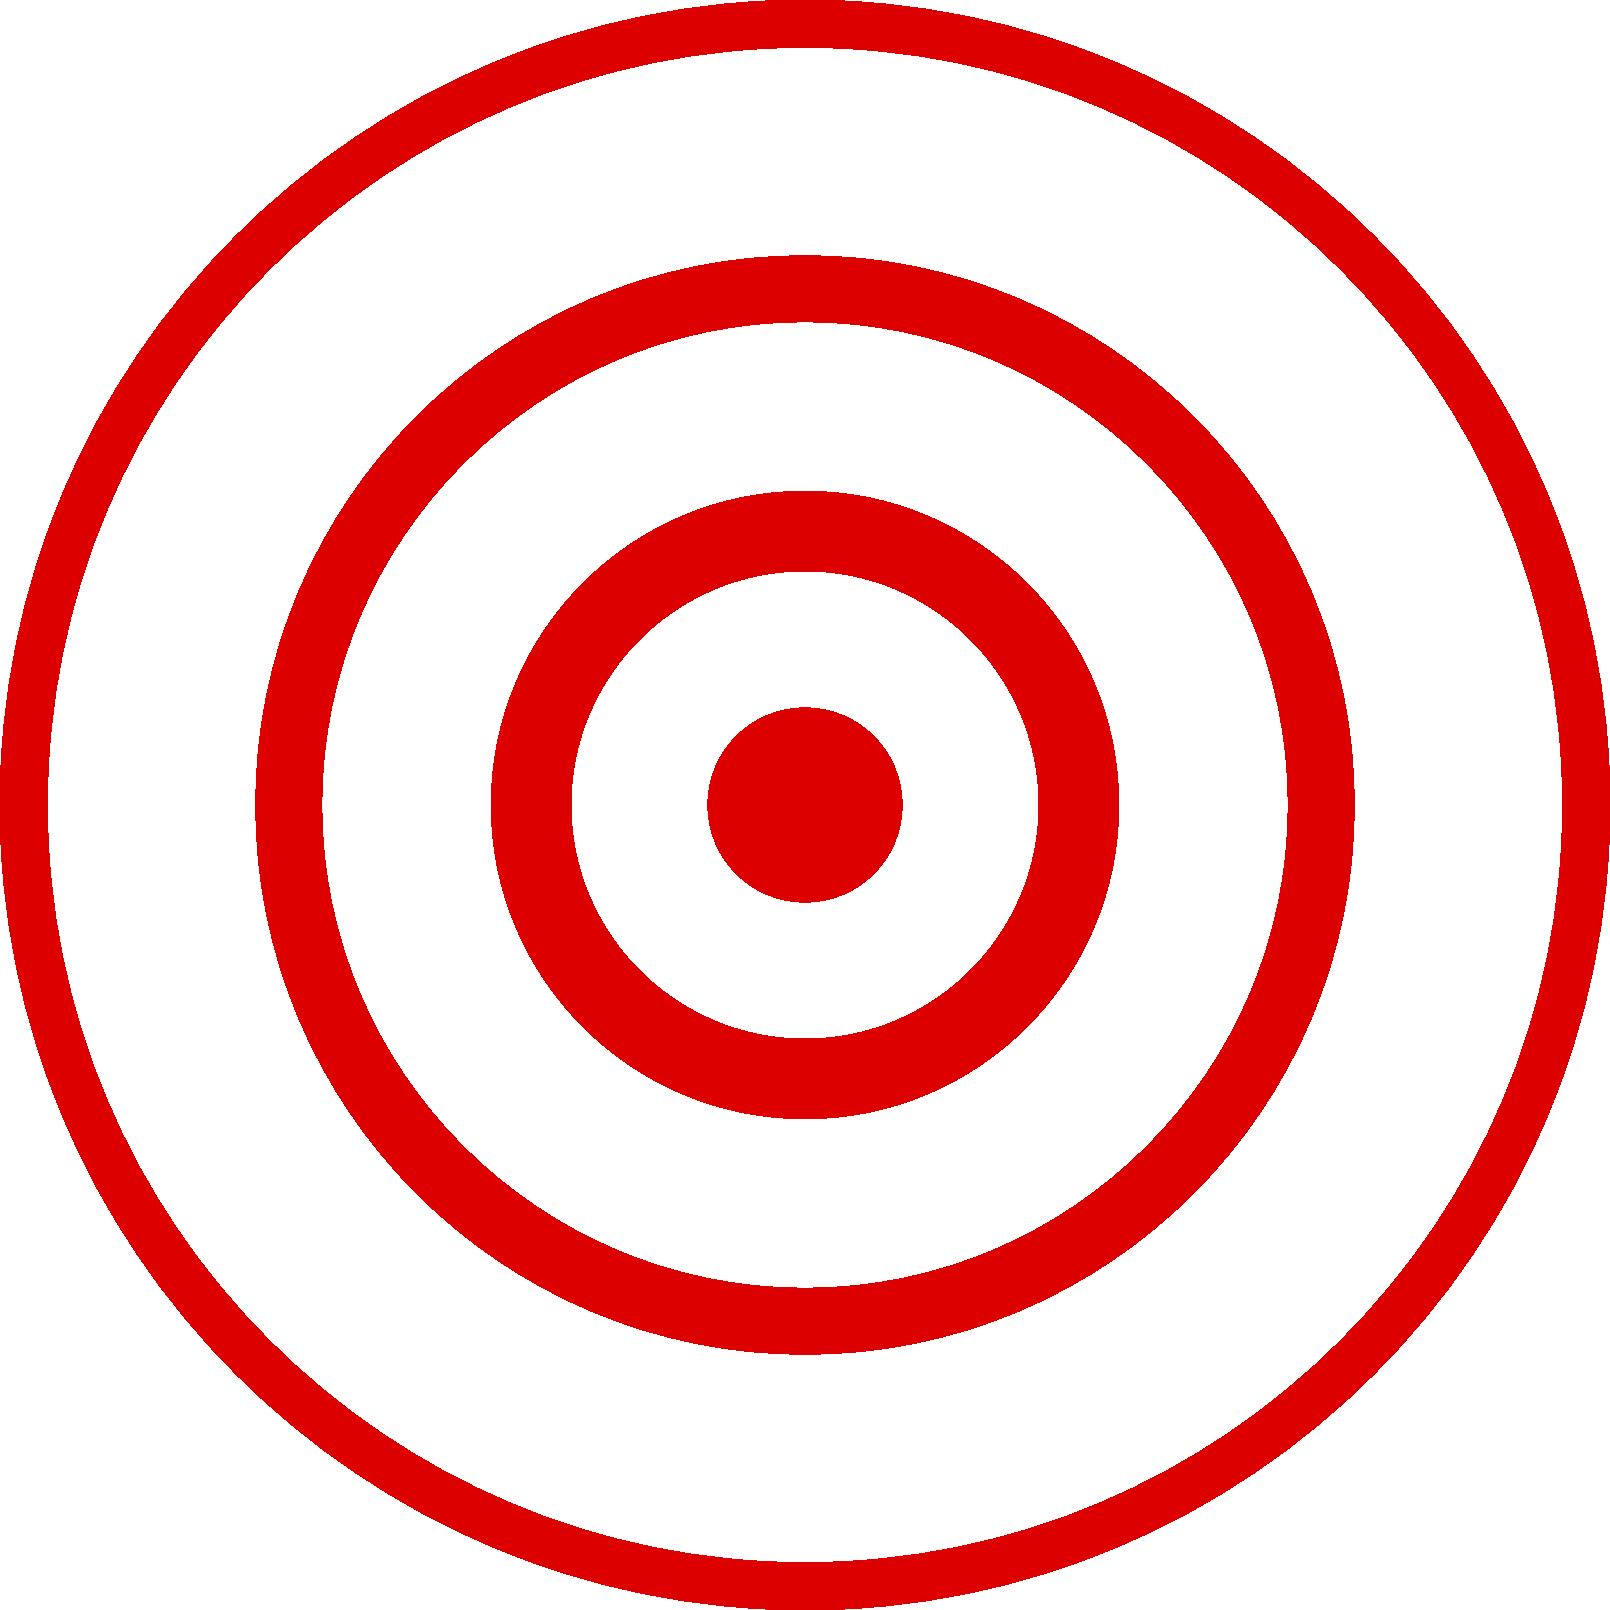 clip art target bullseye - photo #24